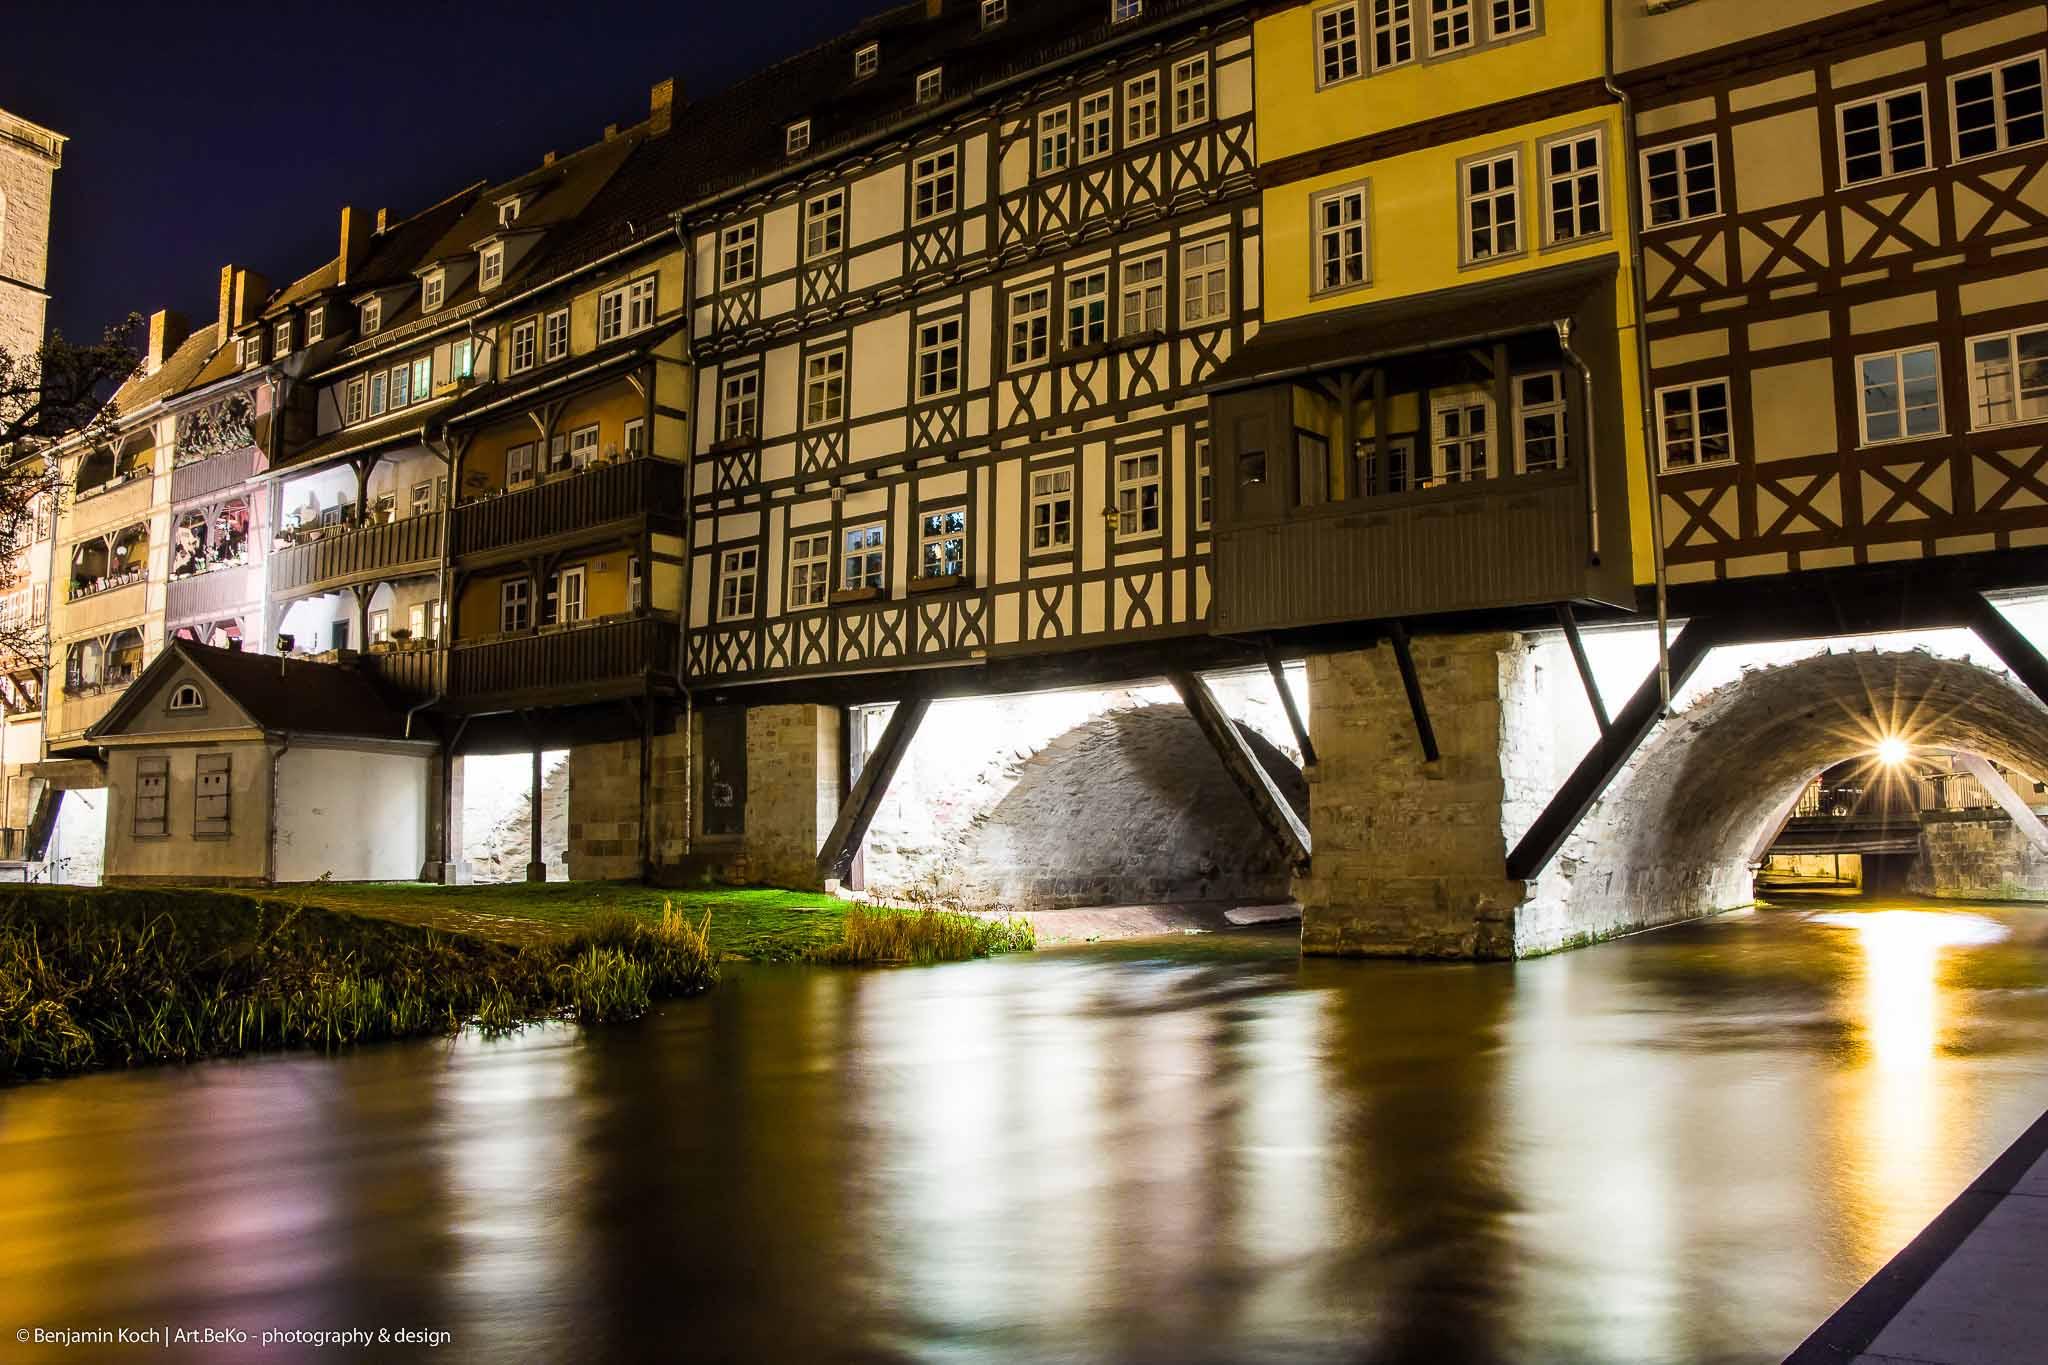 Fotografie Langzeitbelichtung Krämerbrücke Erfurt